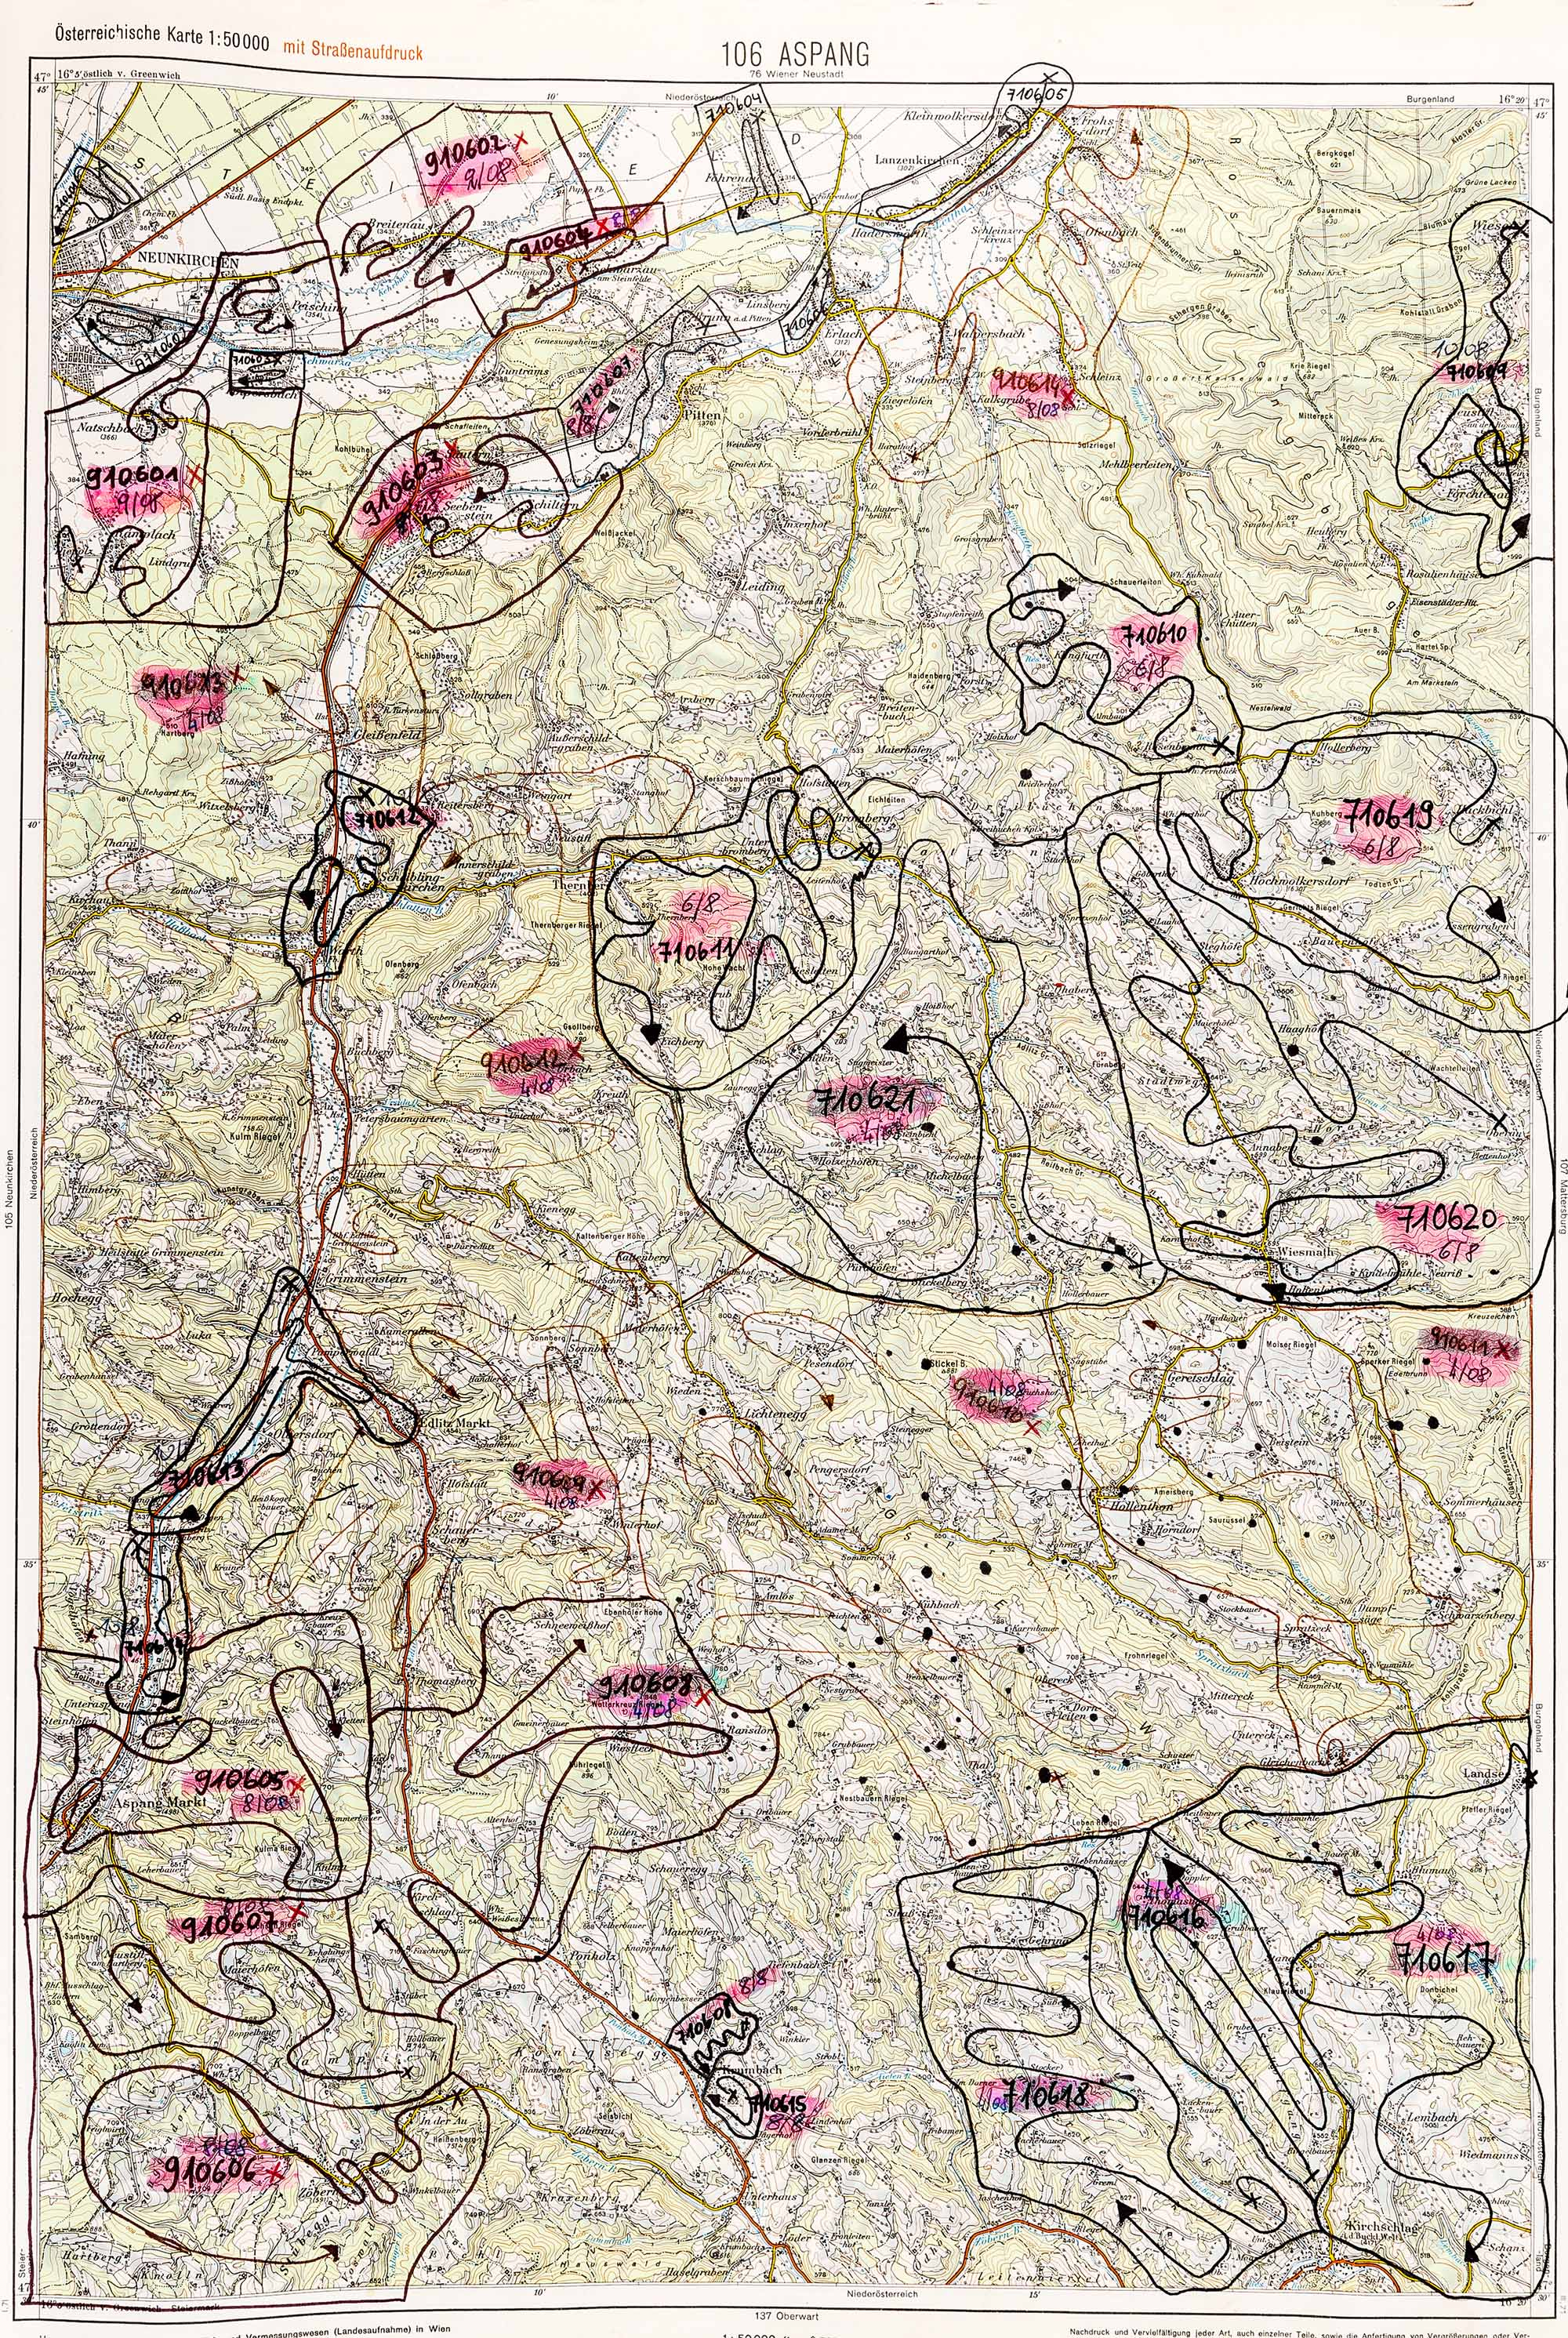 1975-1979 Karte 106